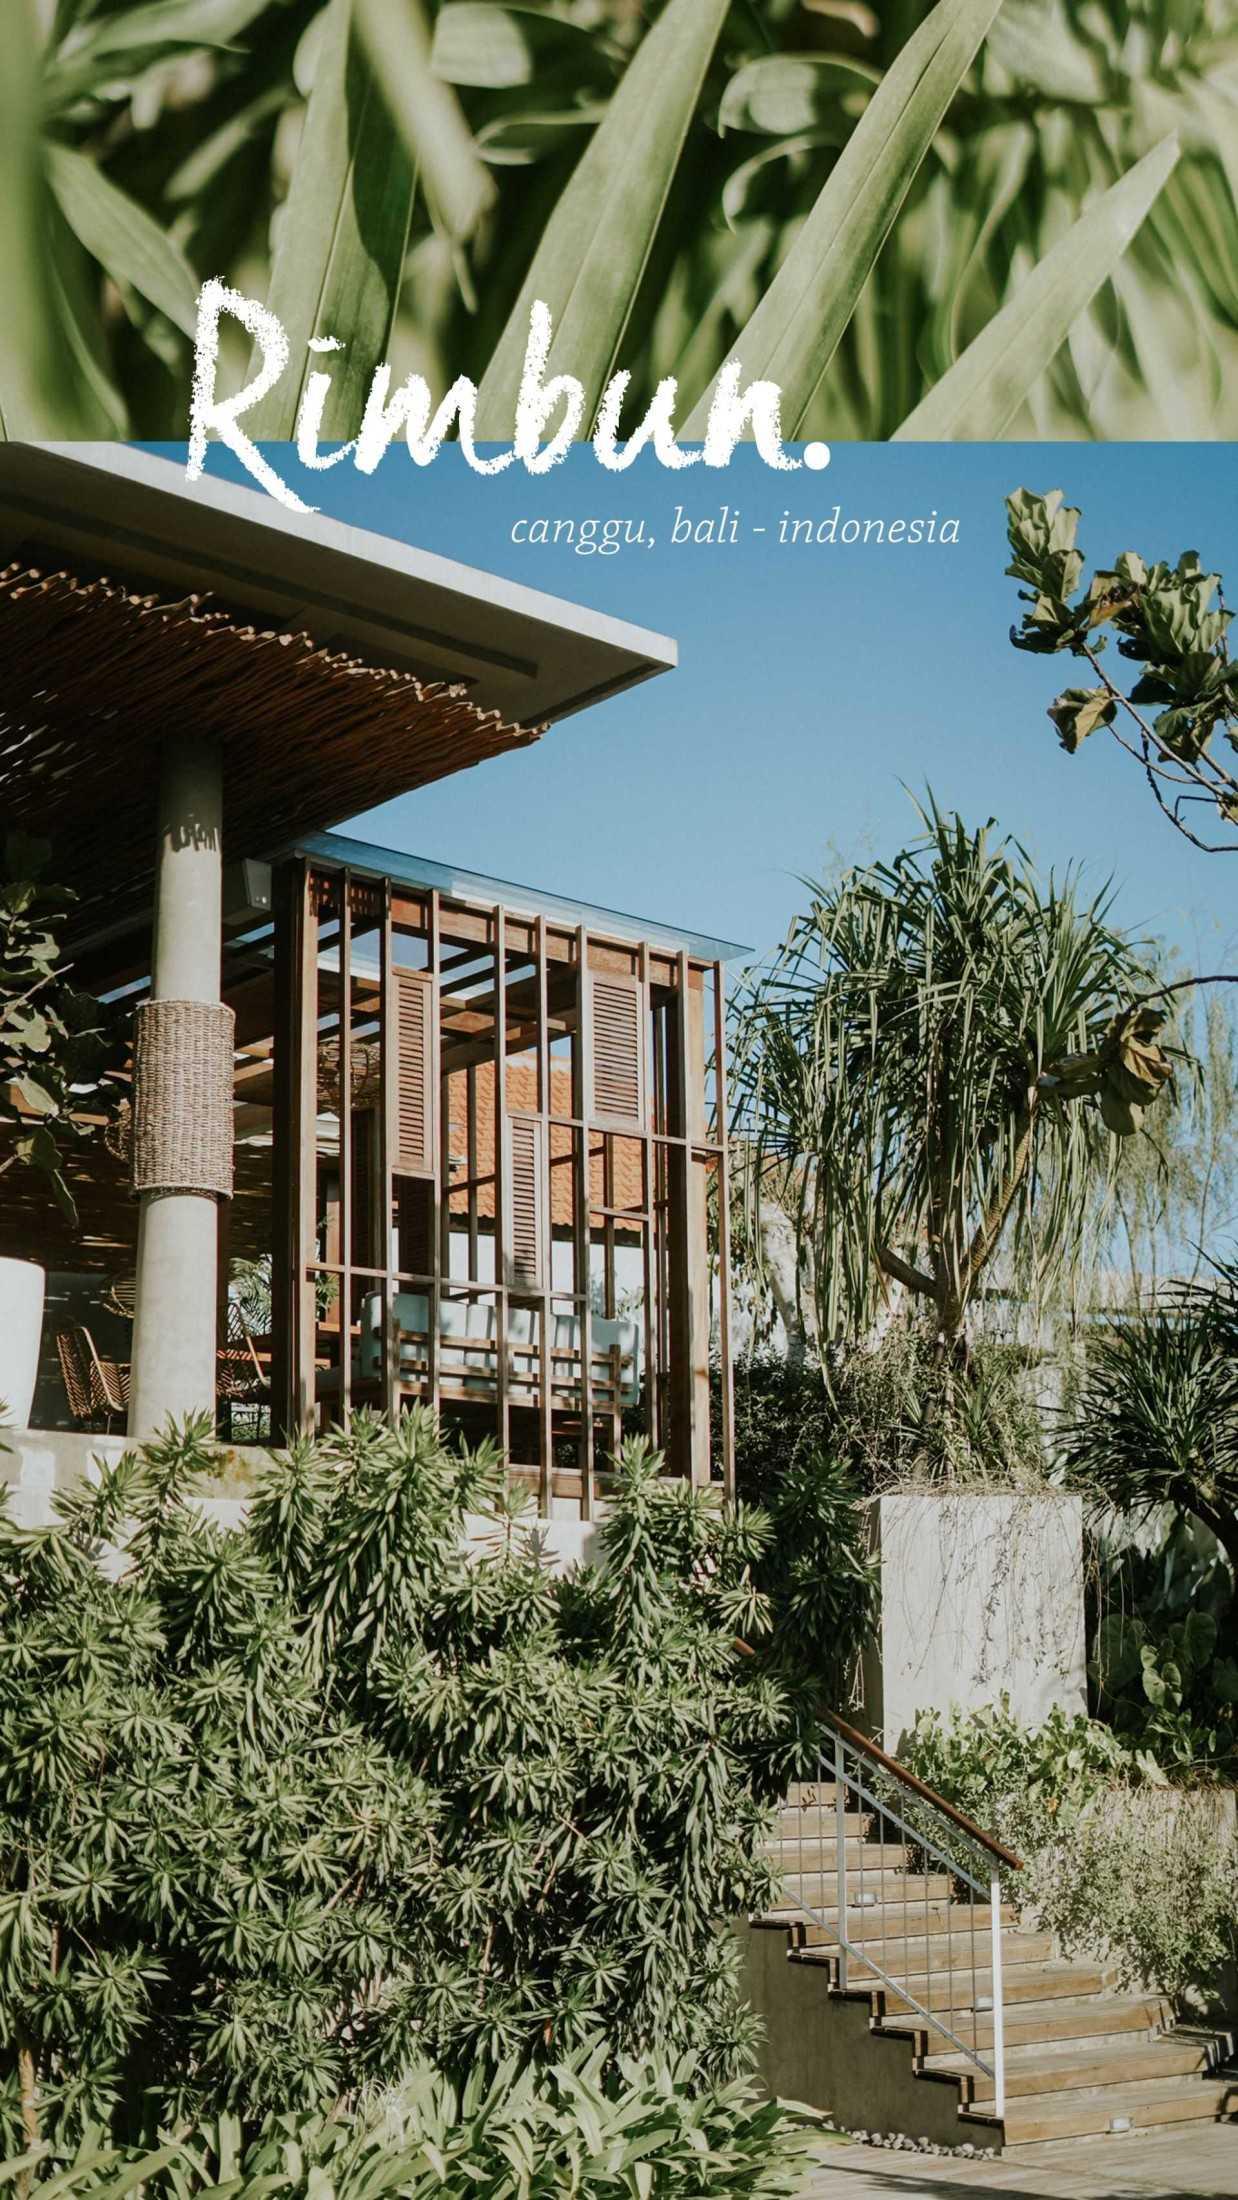 Nitkala Arsitek Rimbun Hotel Canggu, Kec. Kuta Utara, Kabupaten Badung, Bali, Indonesia Canggu, Kec. Kuta Utara, Kabupaten Badung, Bali, Indonesia Nitkala-Arsitek-Rimbun-Hotel  121608